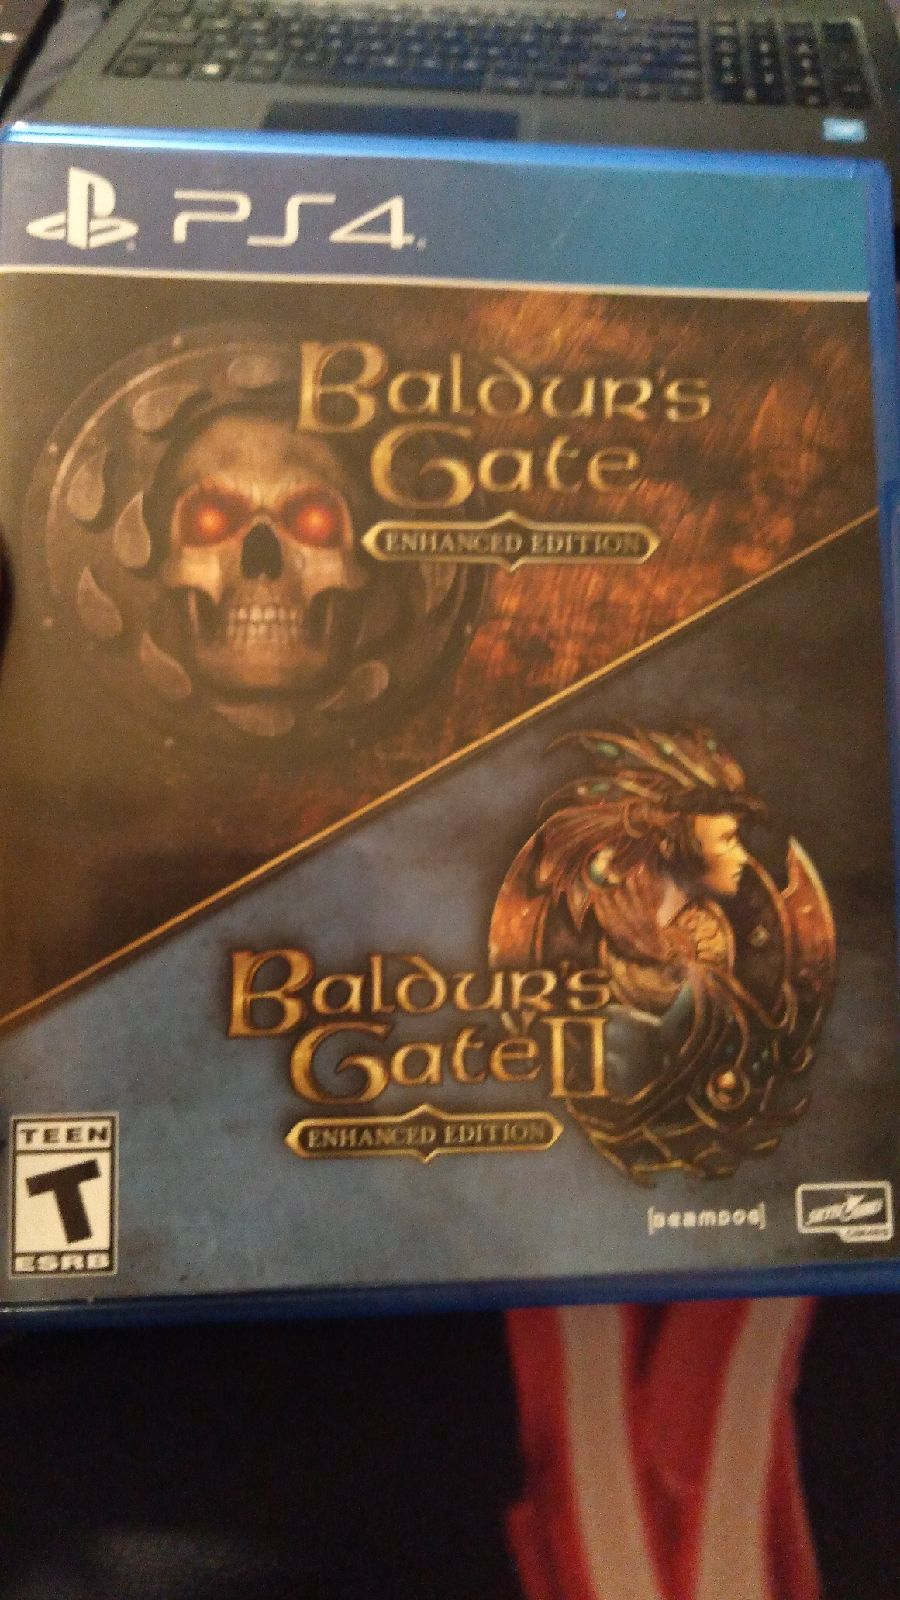 PS4 Baldurs Gate 1 and 2 Enhanced Editio